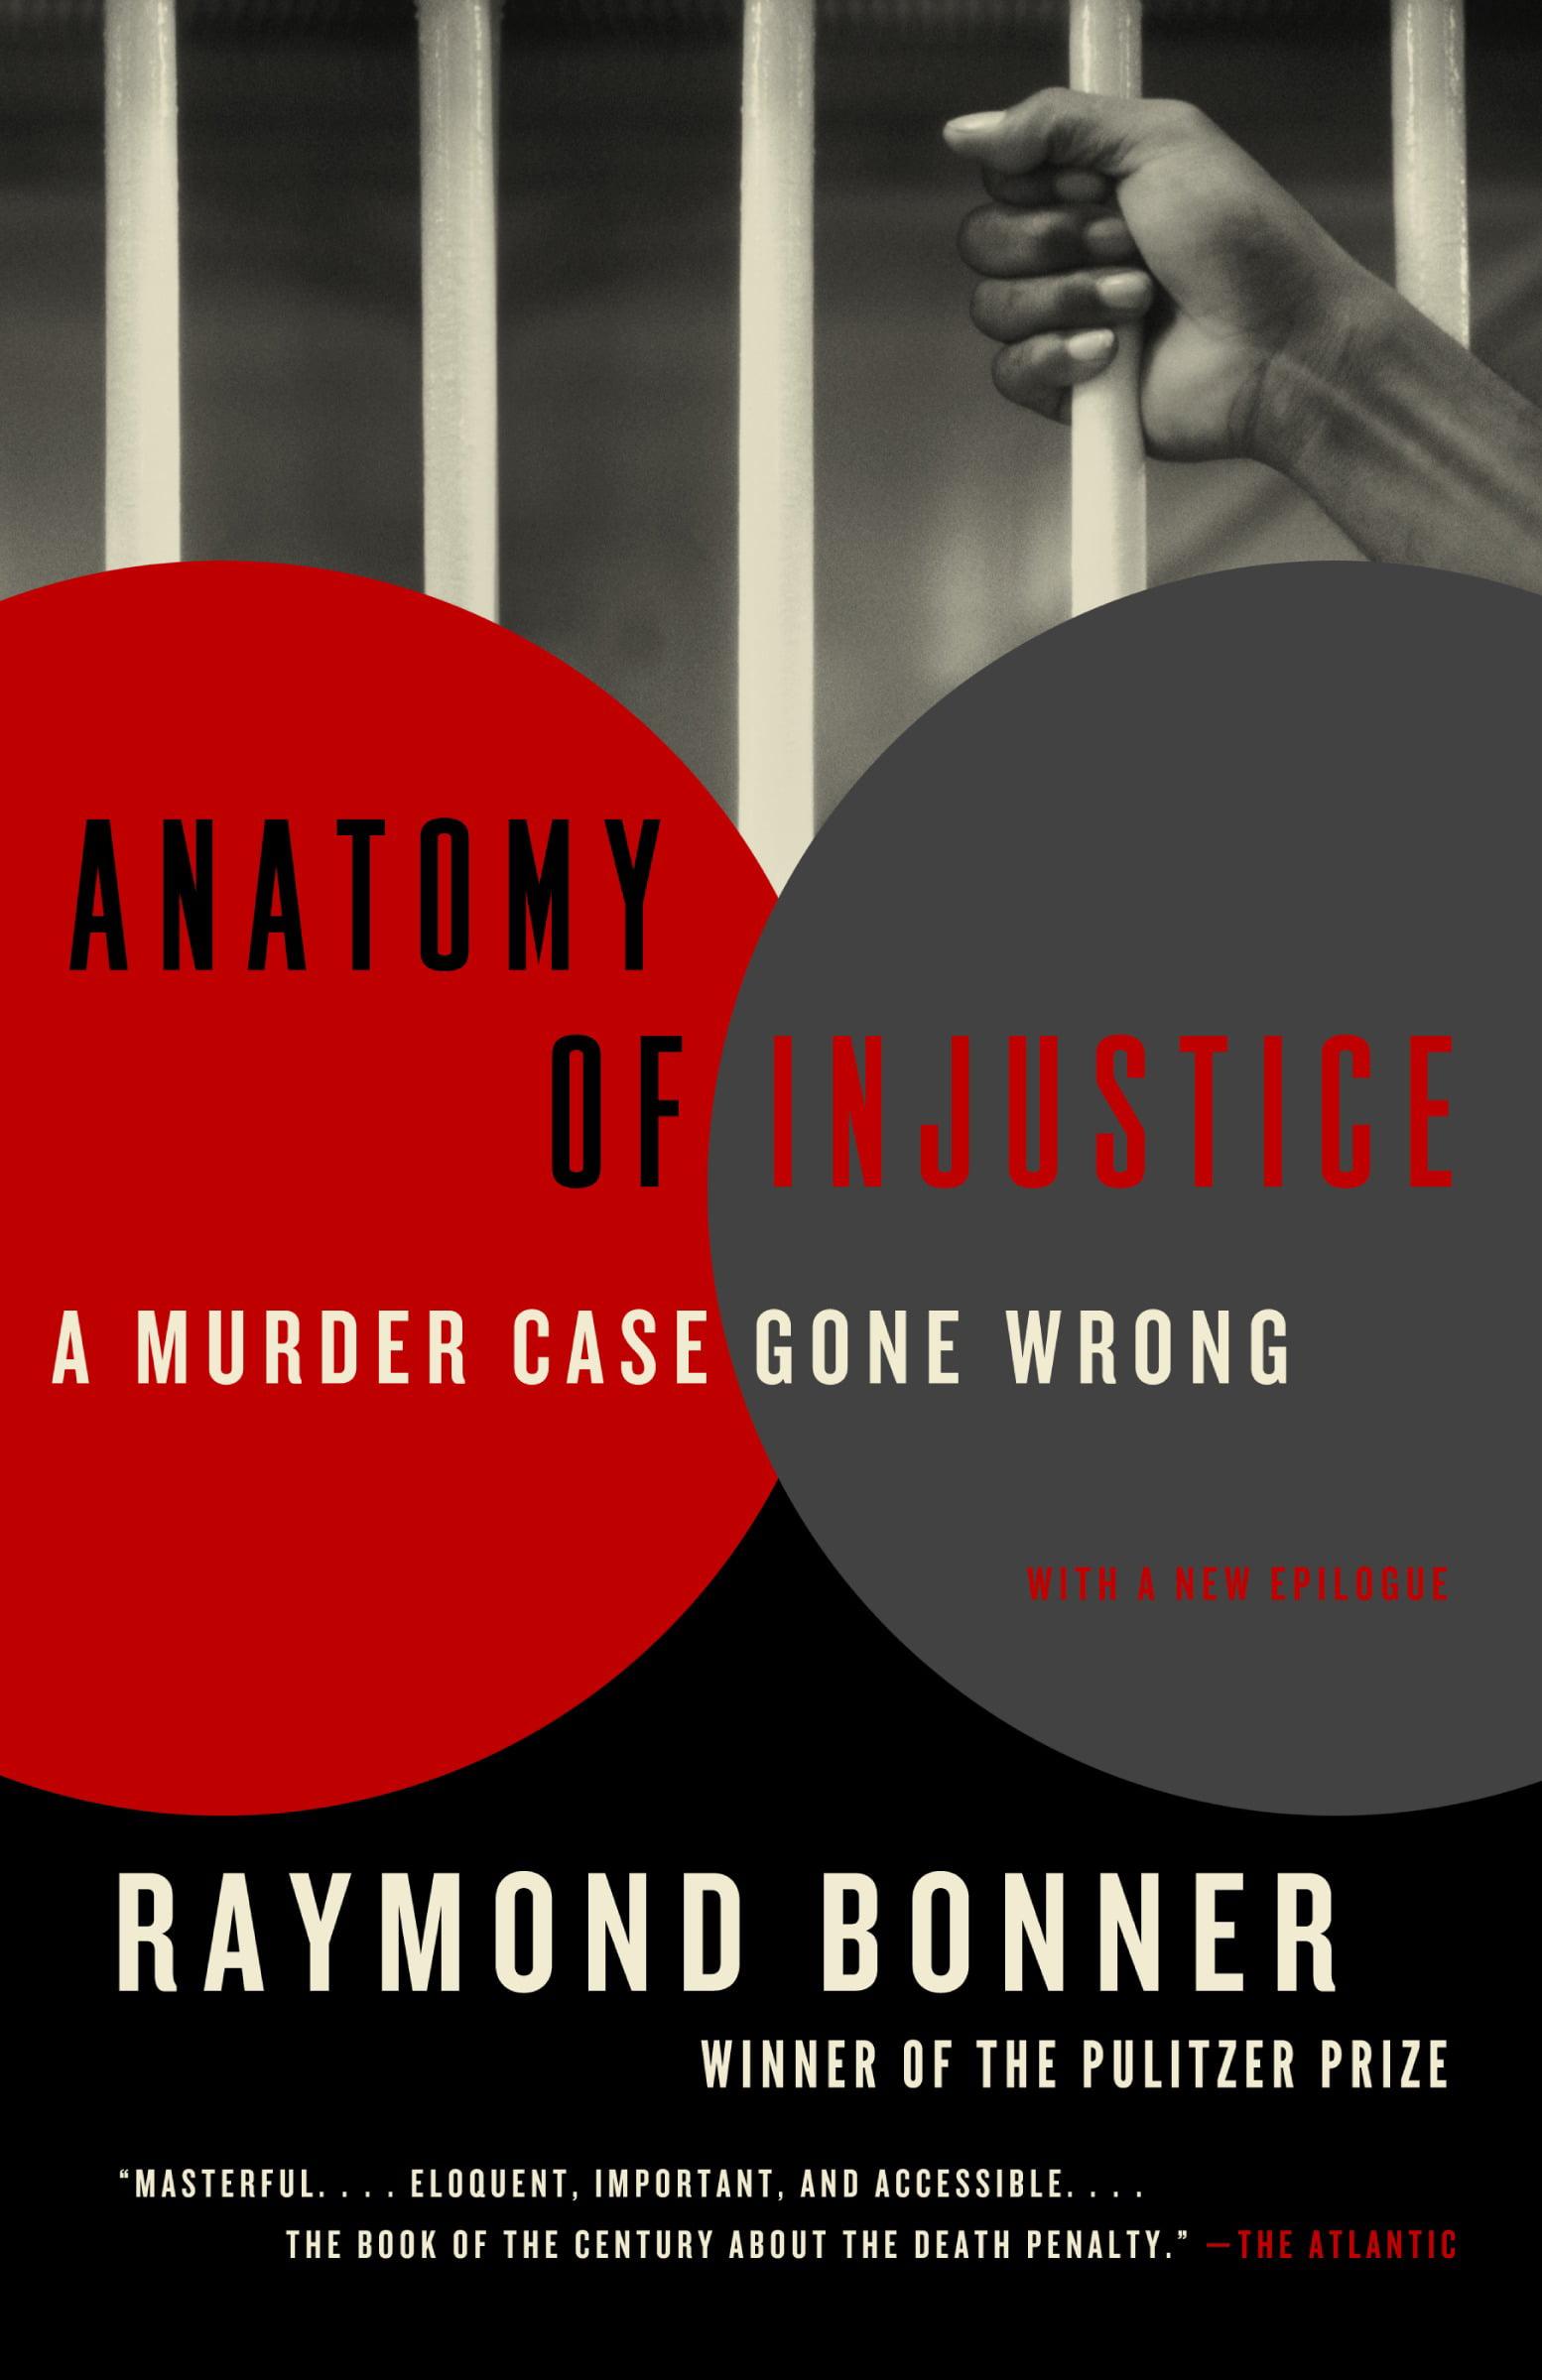 Anatomy of Injustice : A Murder Case Gone Wrong - Walmart.com